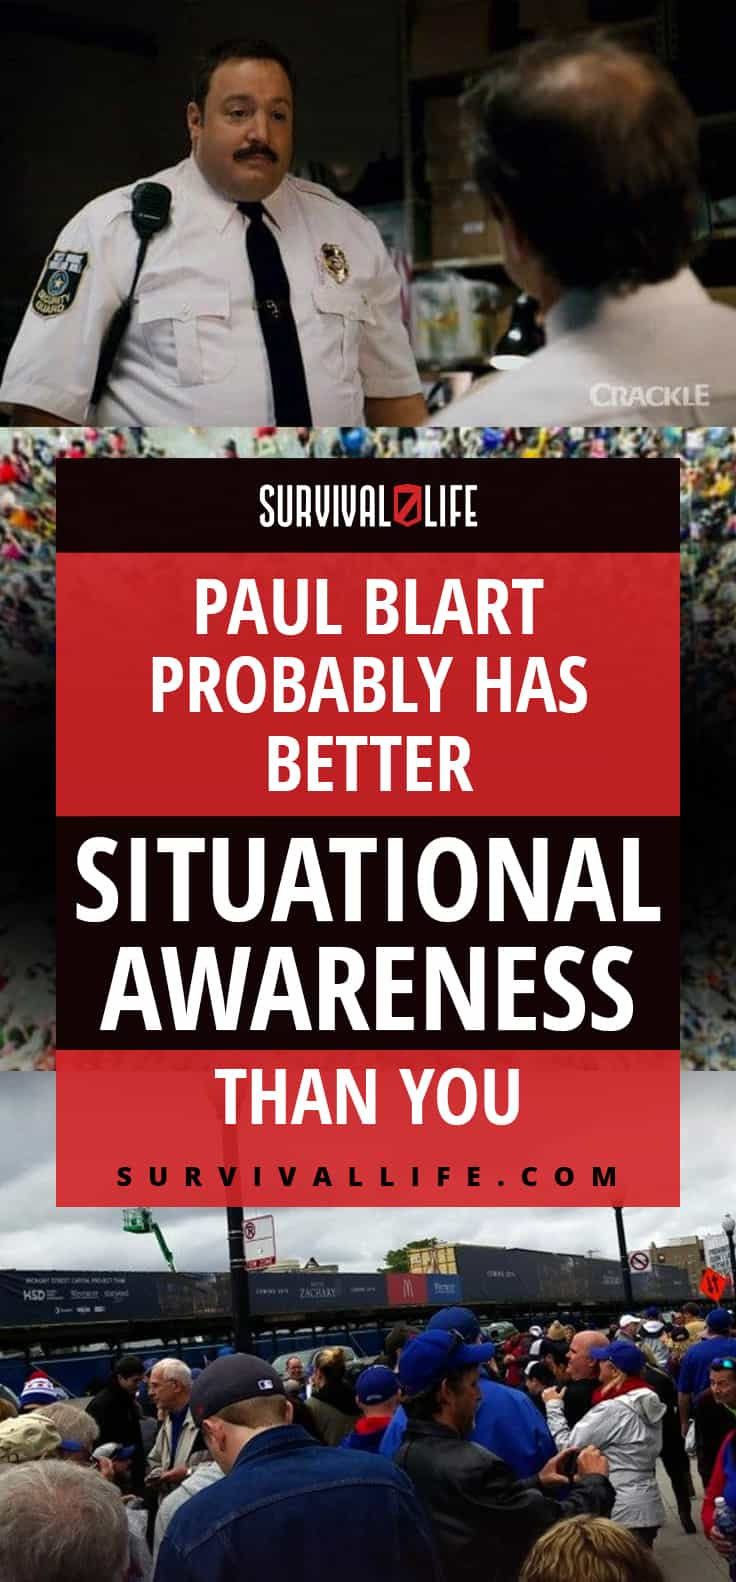 Paul Blart Probably Has Better Situational Awareness Than You